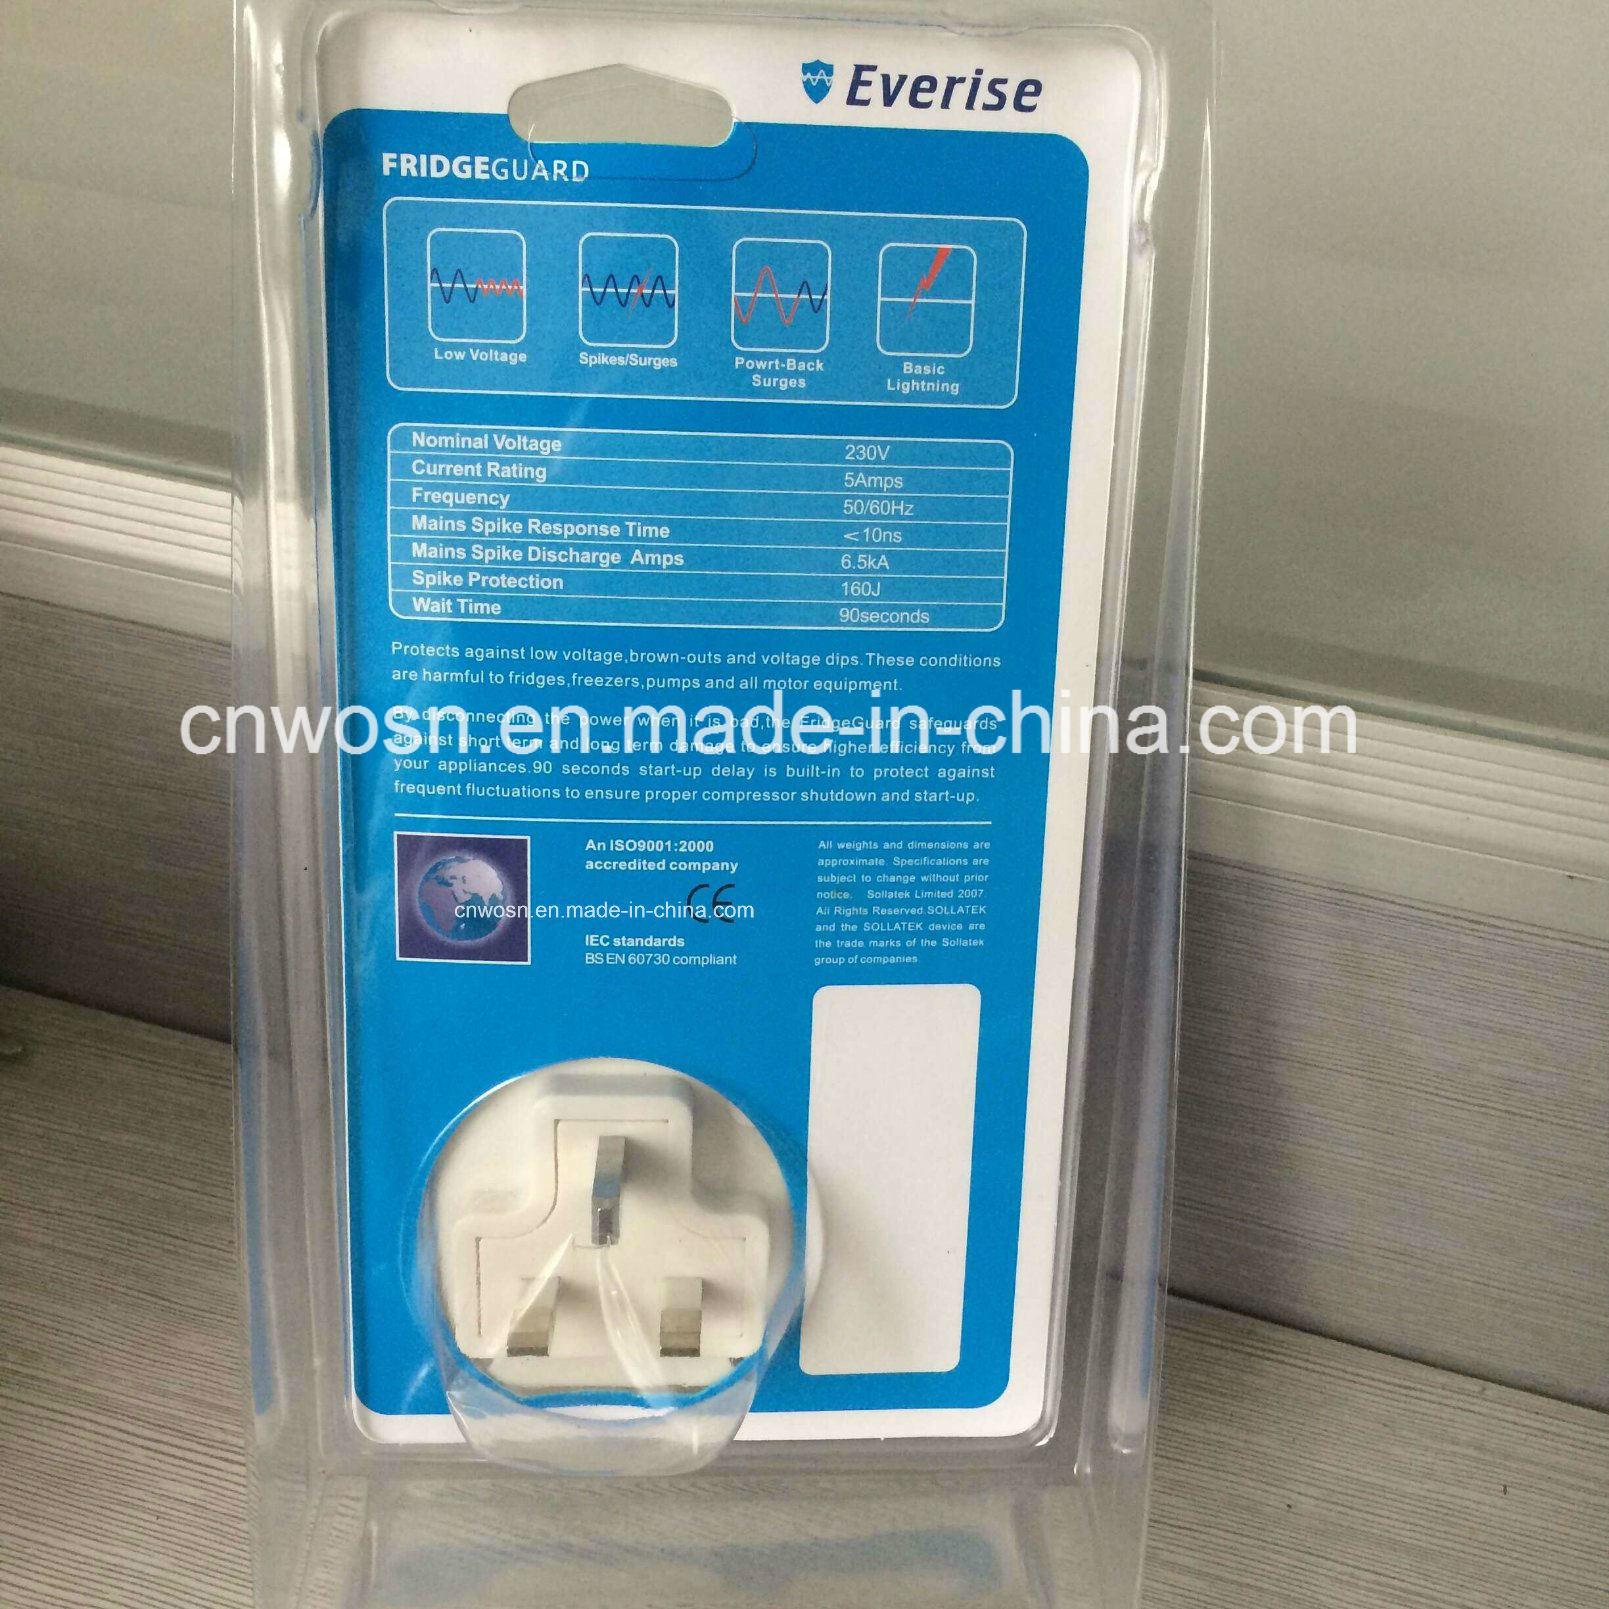 Fridge Guard 5A 7A 13A AVS Refrigerator Voltage Protector